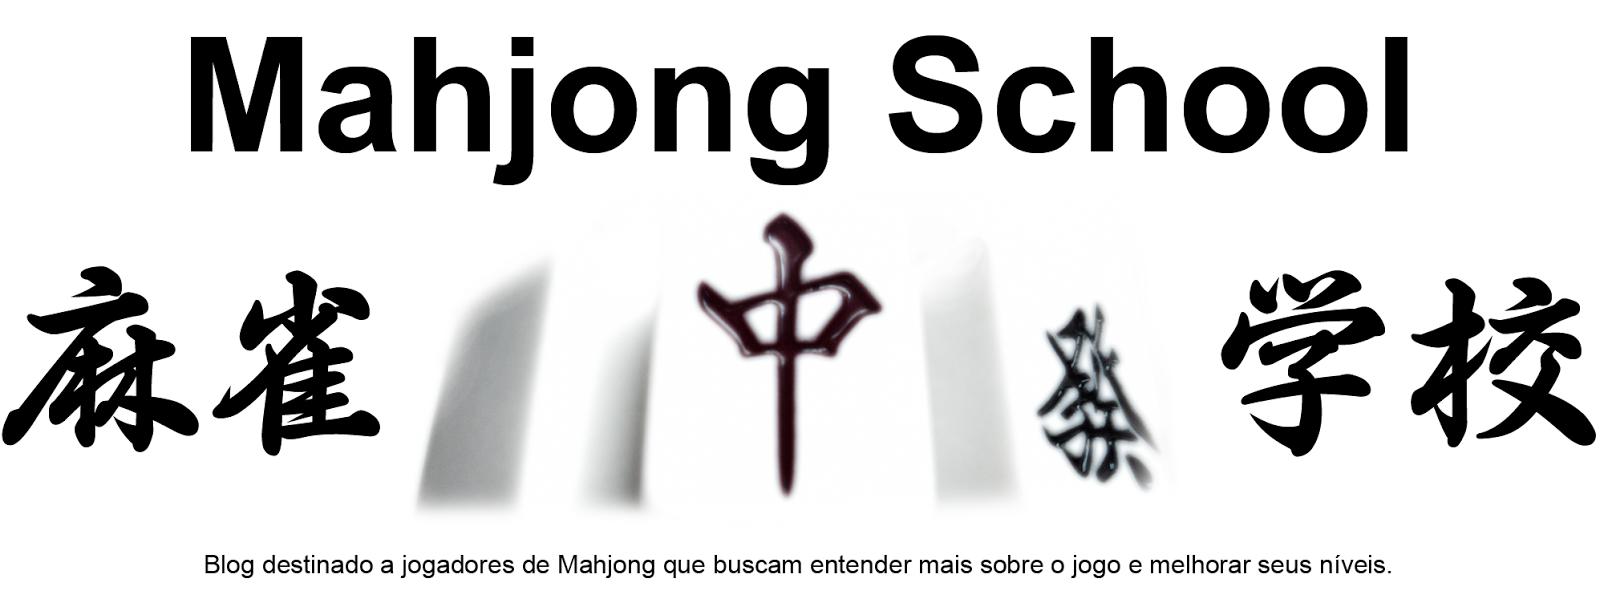 Mahjong School